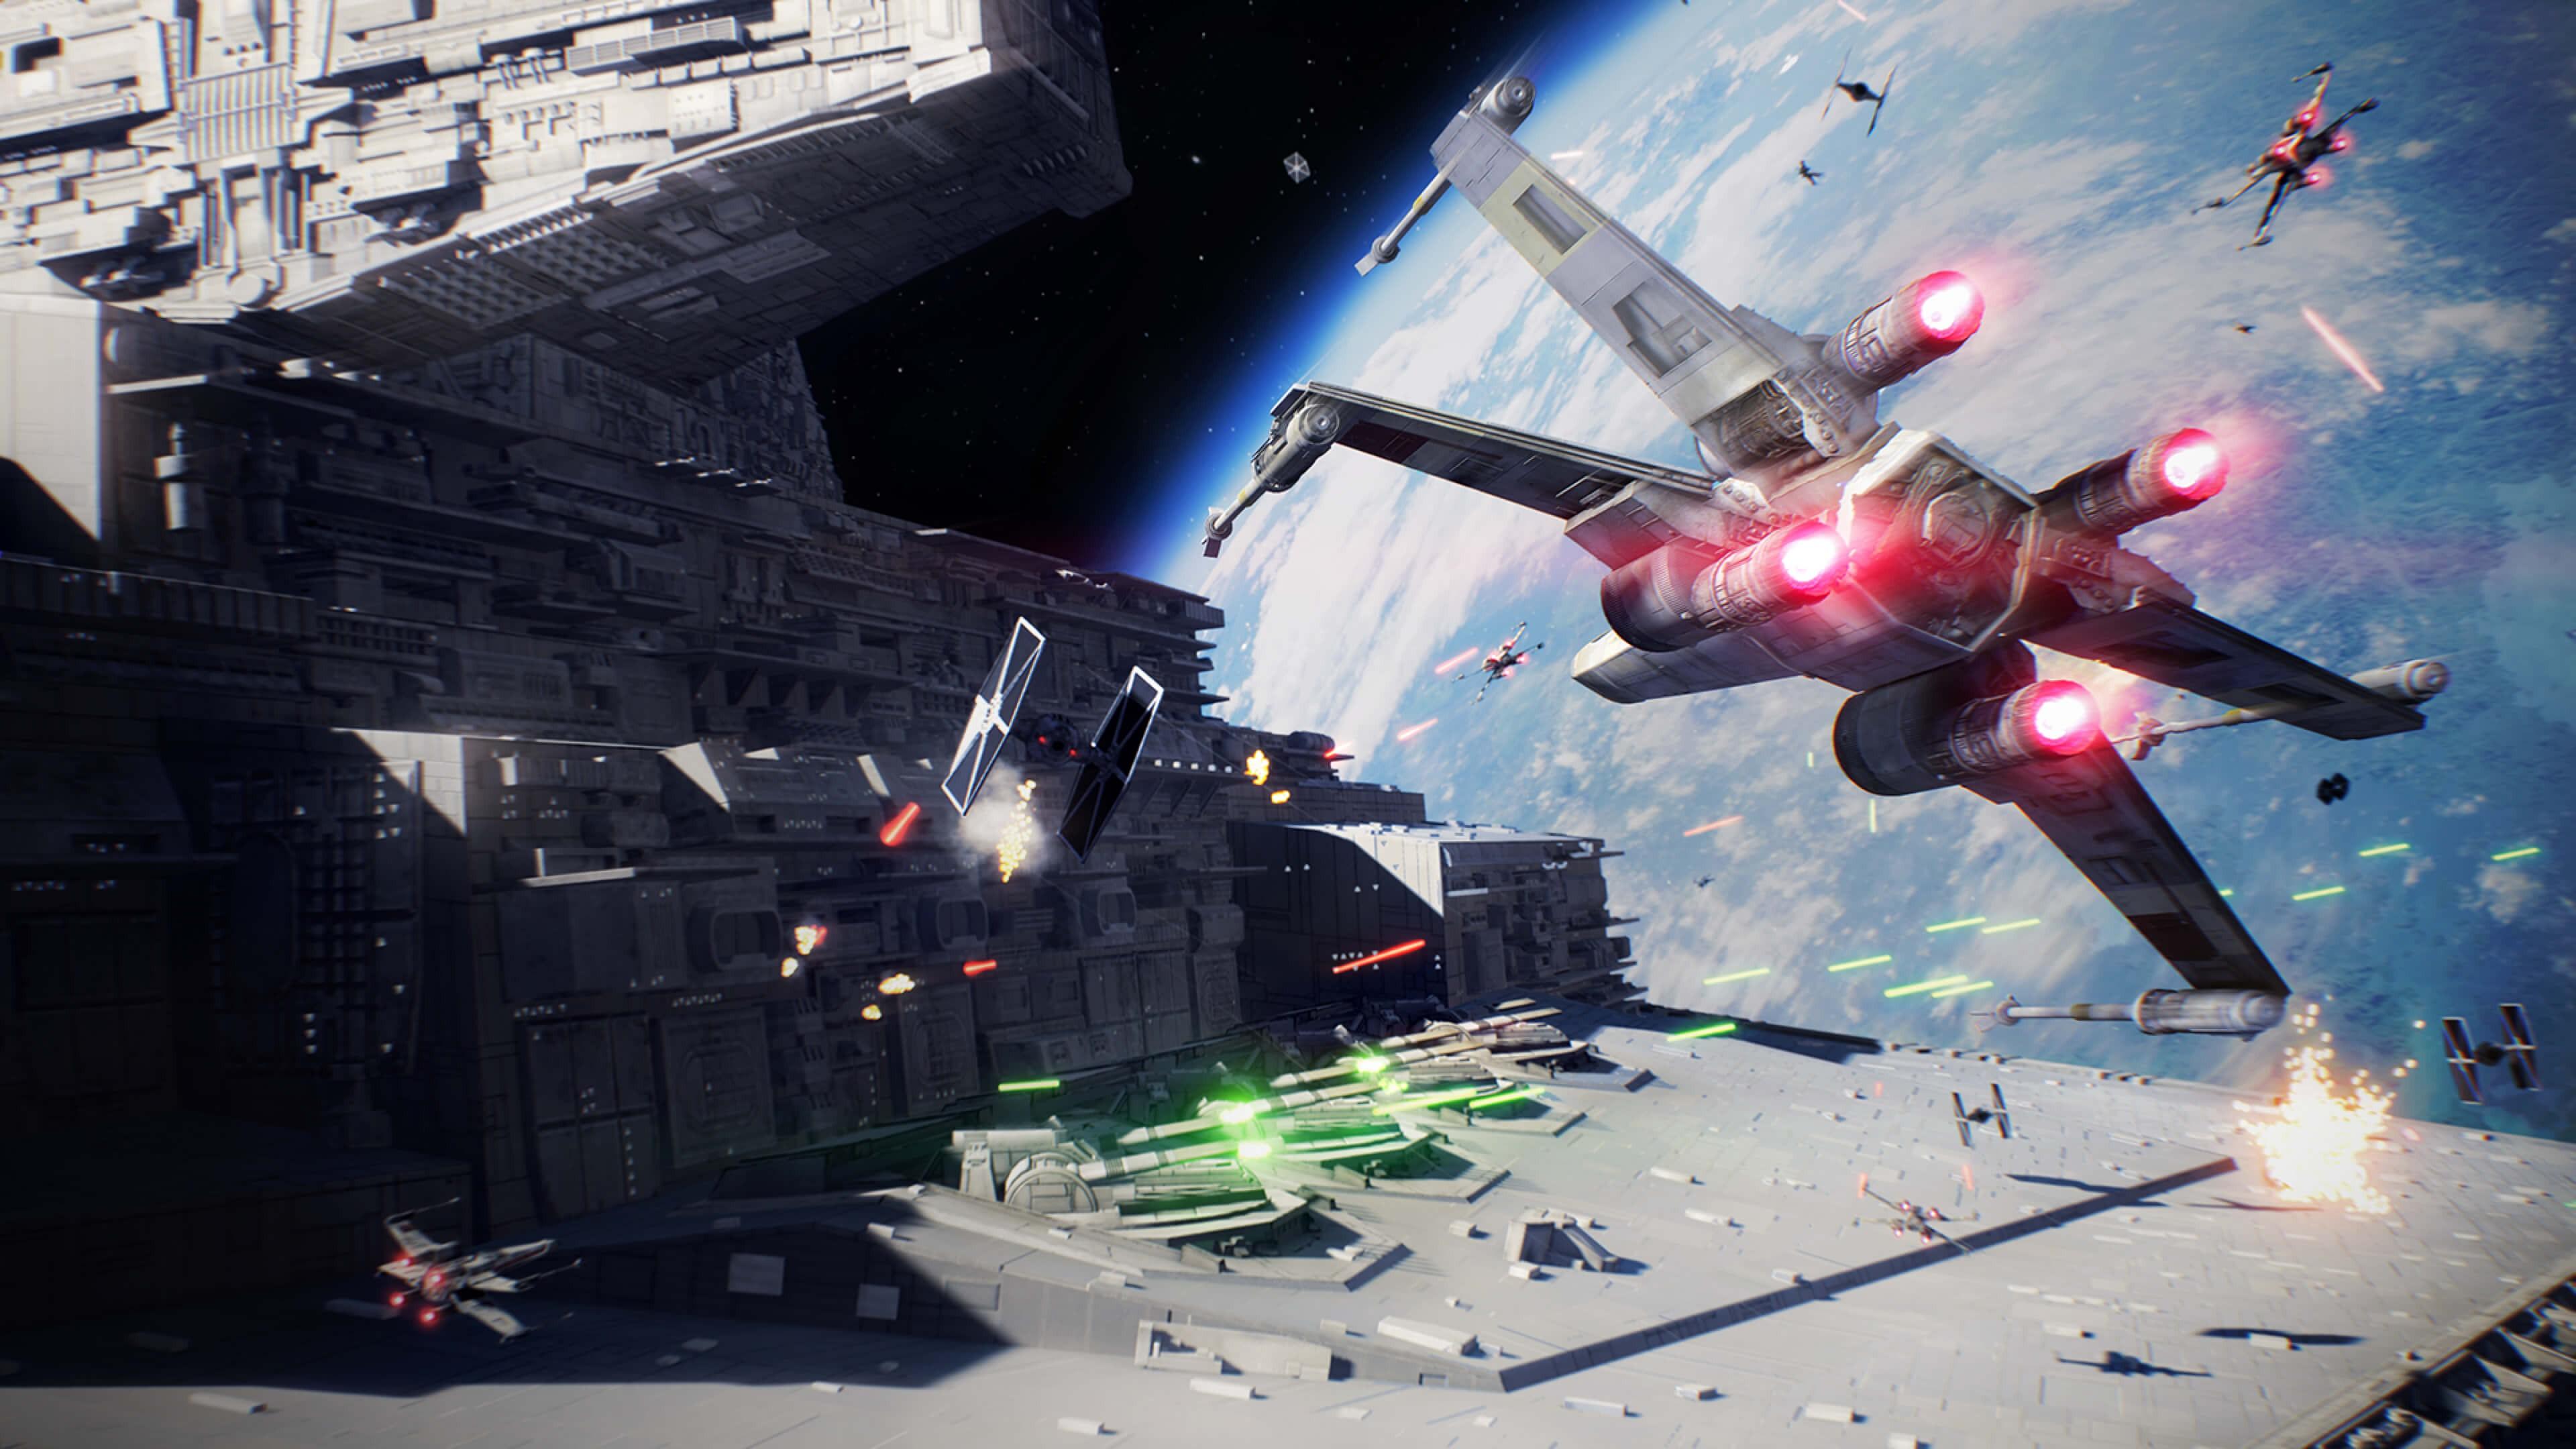 Wallpaper Star Wars Battlefront Ii 4k Screenshot Games 13413 Page 4